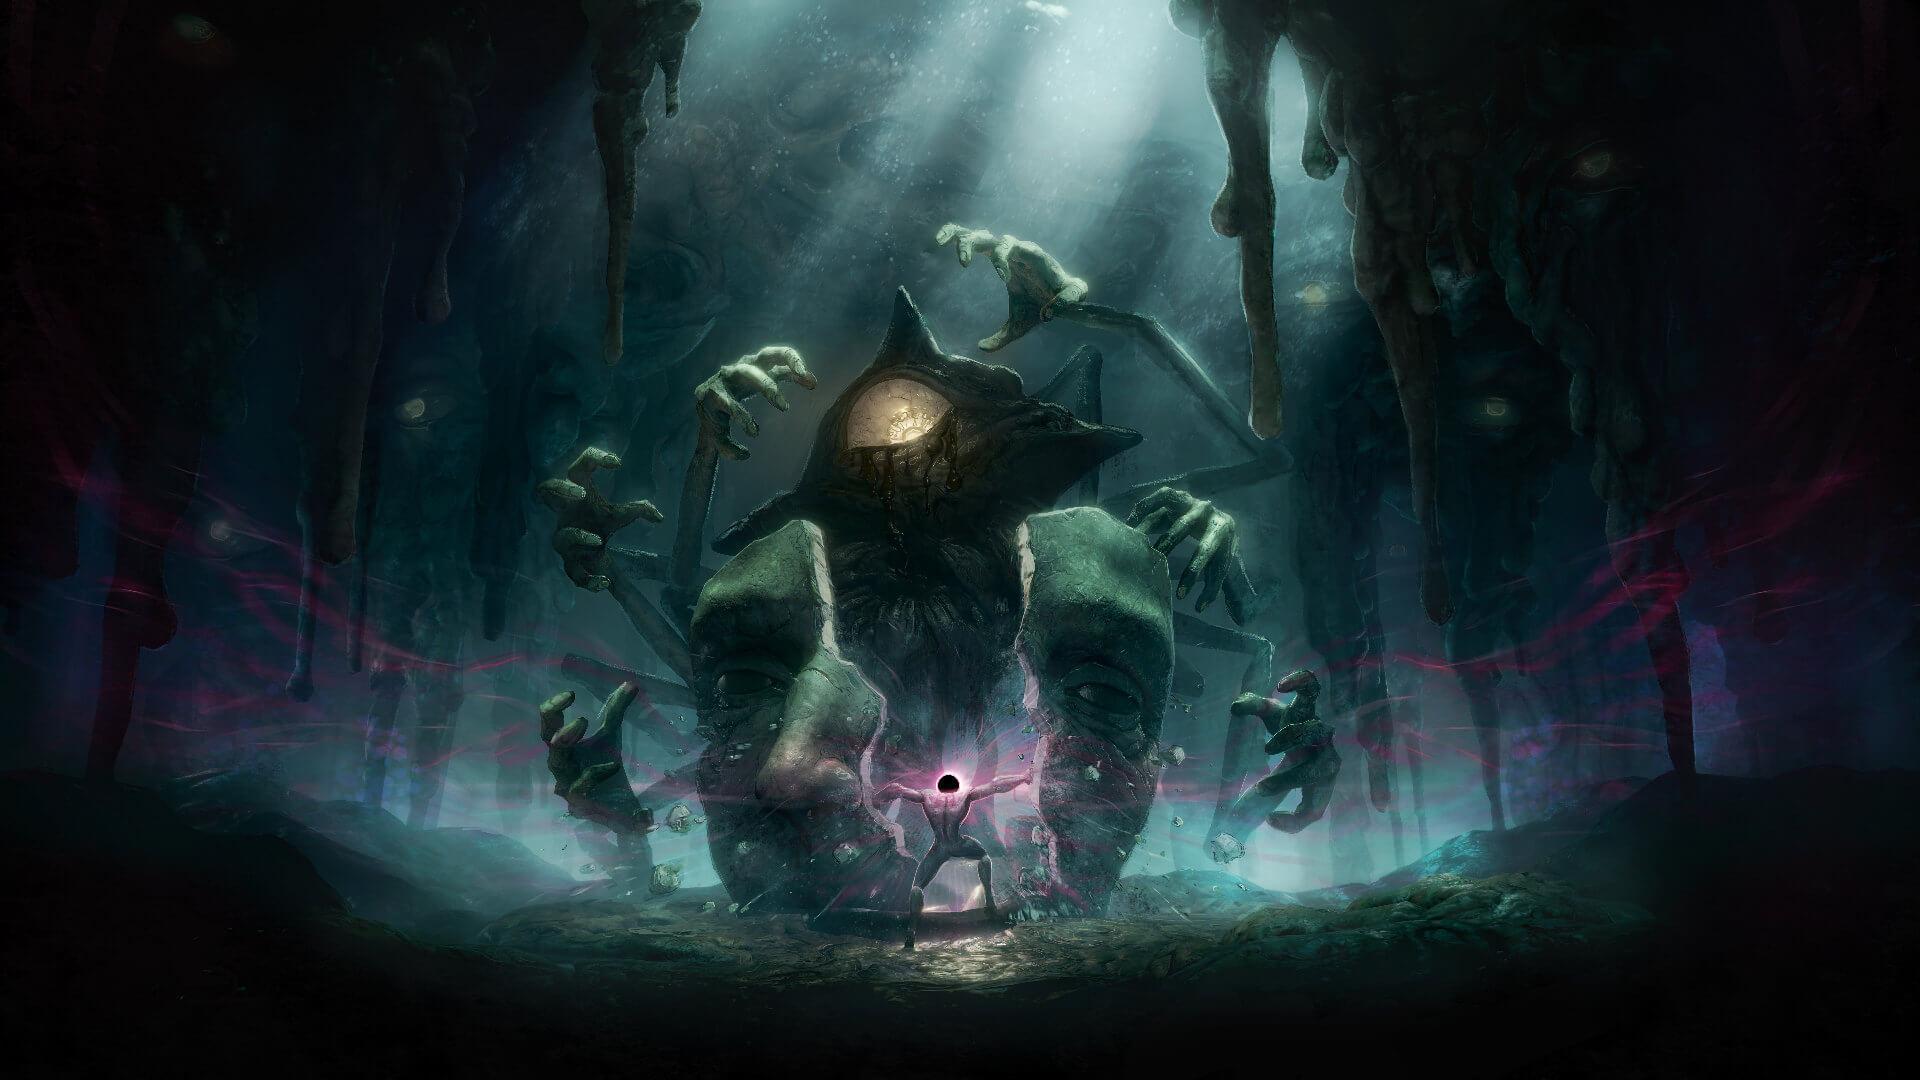 GRIME released key art